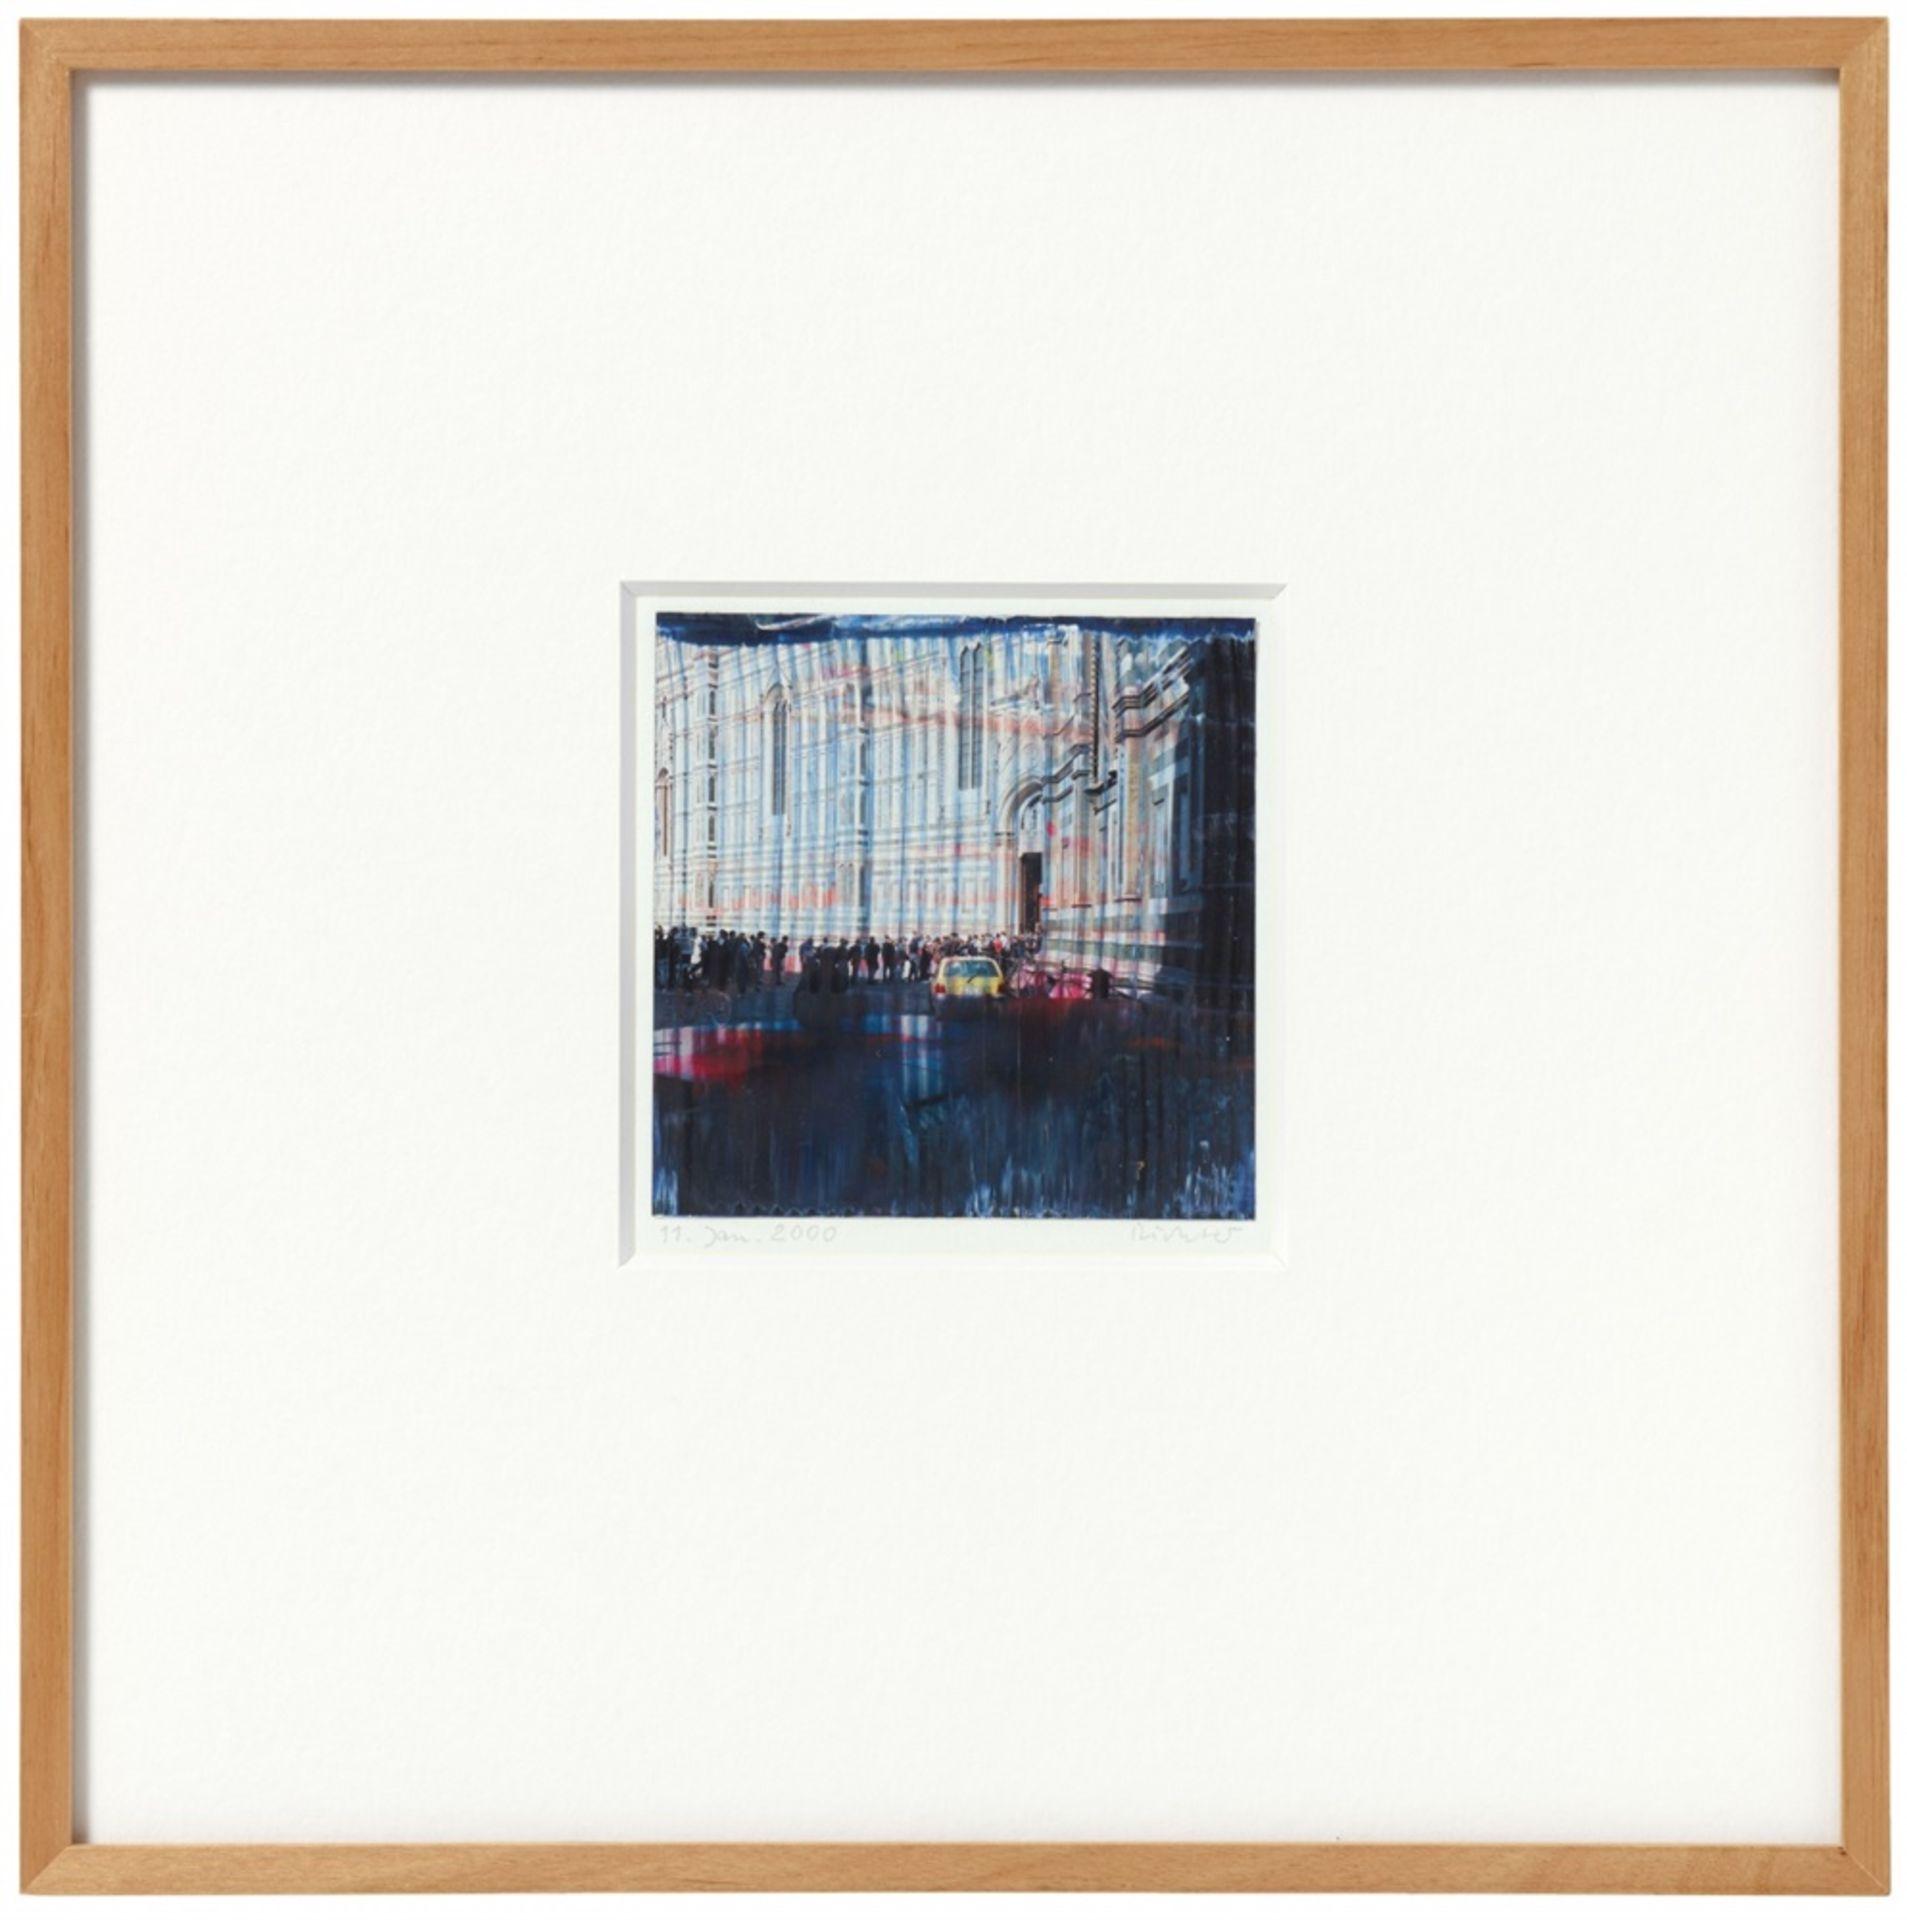 Gerhard Richter11. Jan. 2000 (Firenze) - Bild 2 aus 2